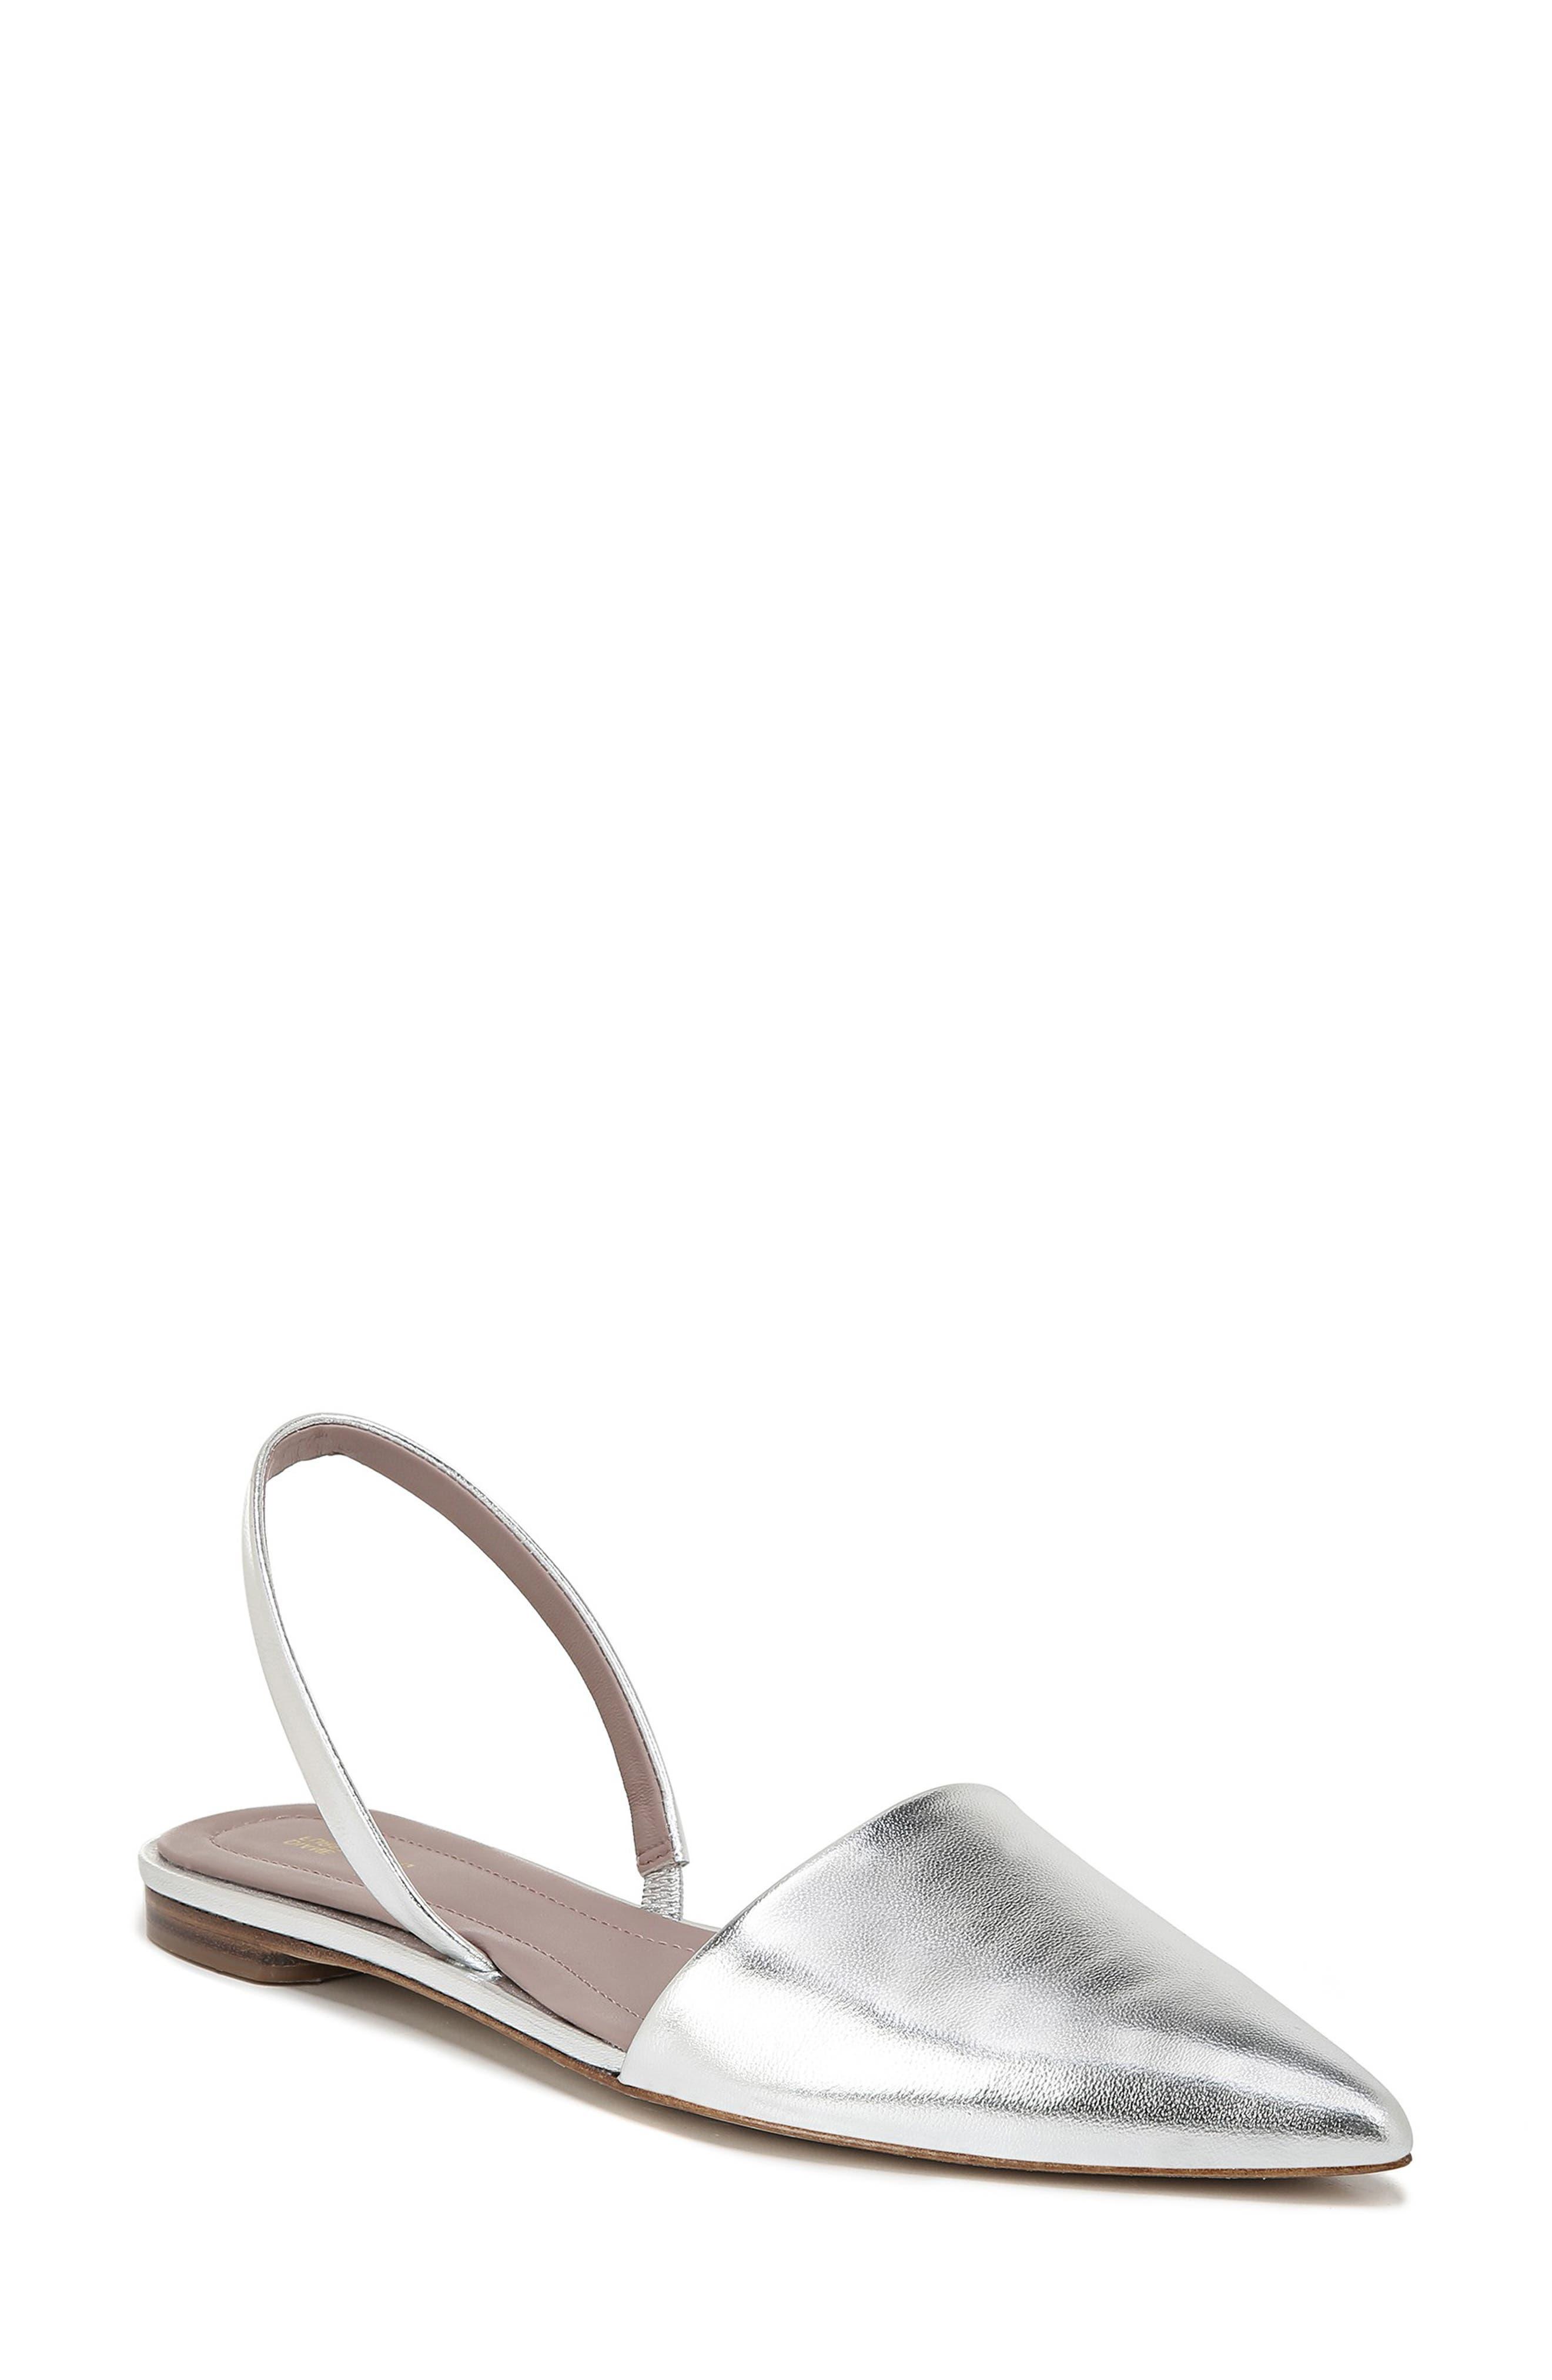 Diane Von Furstenberg Koko Slingback Flat, Metallic